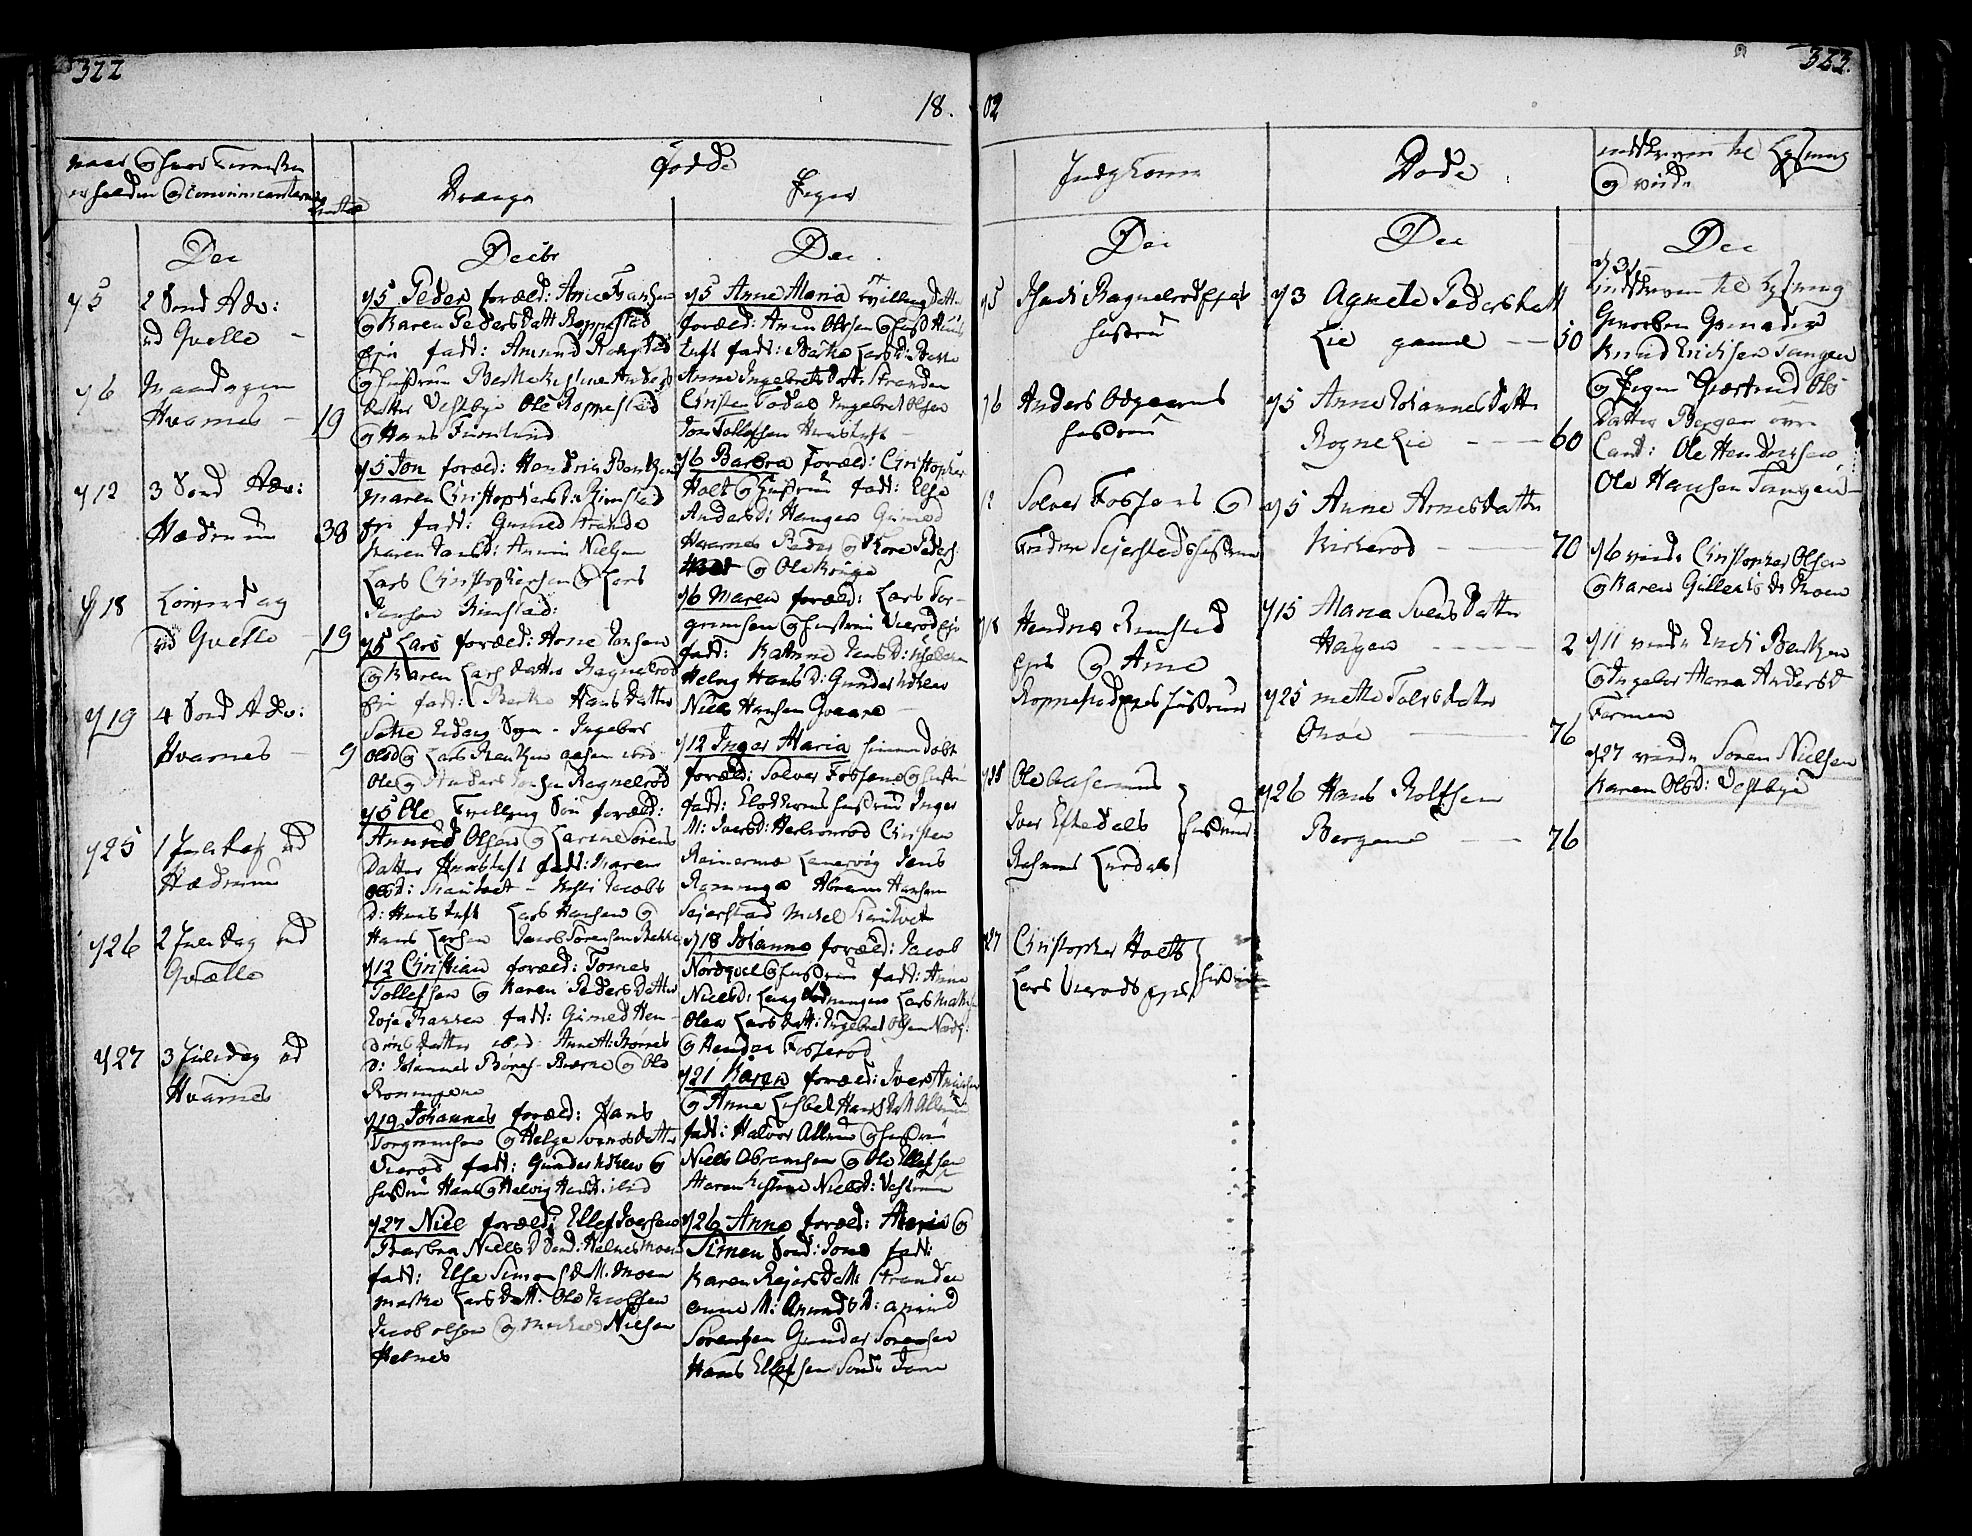 SAKO, Hedrum kirkebøker, F/Fa/L0002: Ministerialbok nr. I 2, 1785-1807, s. 322-323